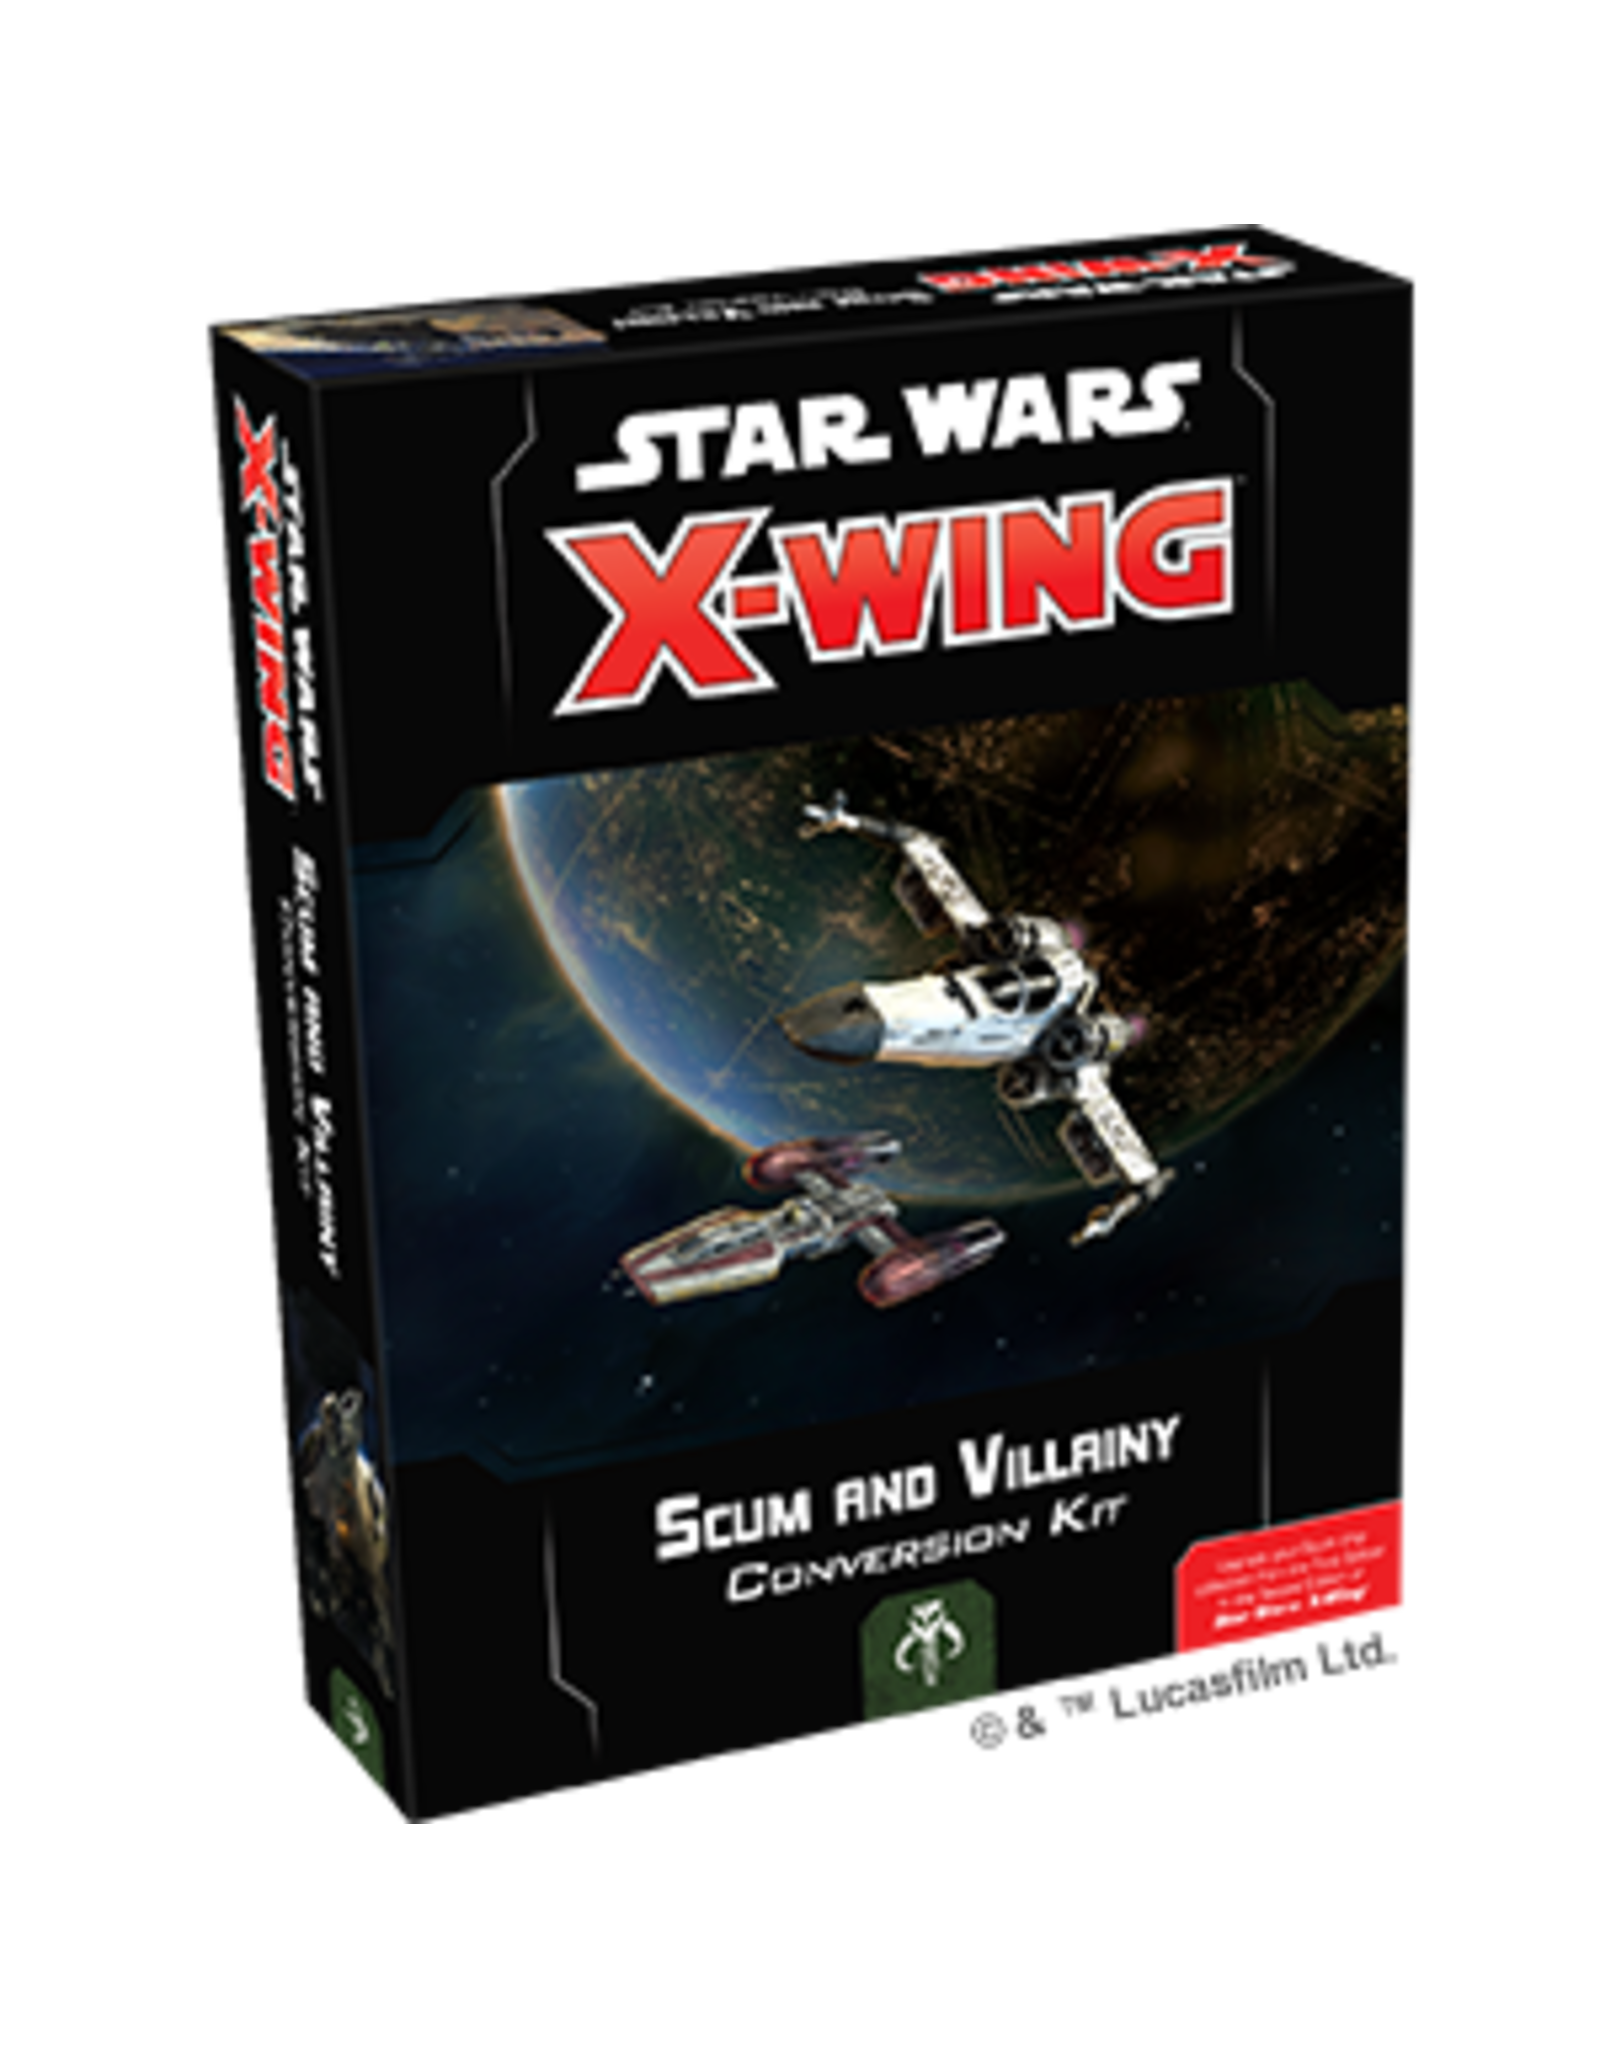 Fantasy Flight Games Star Wars X-wing 2E: Scum and Villainy Conversion Kit